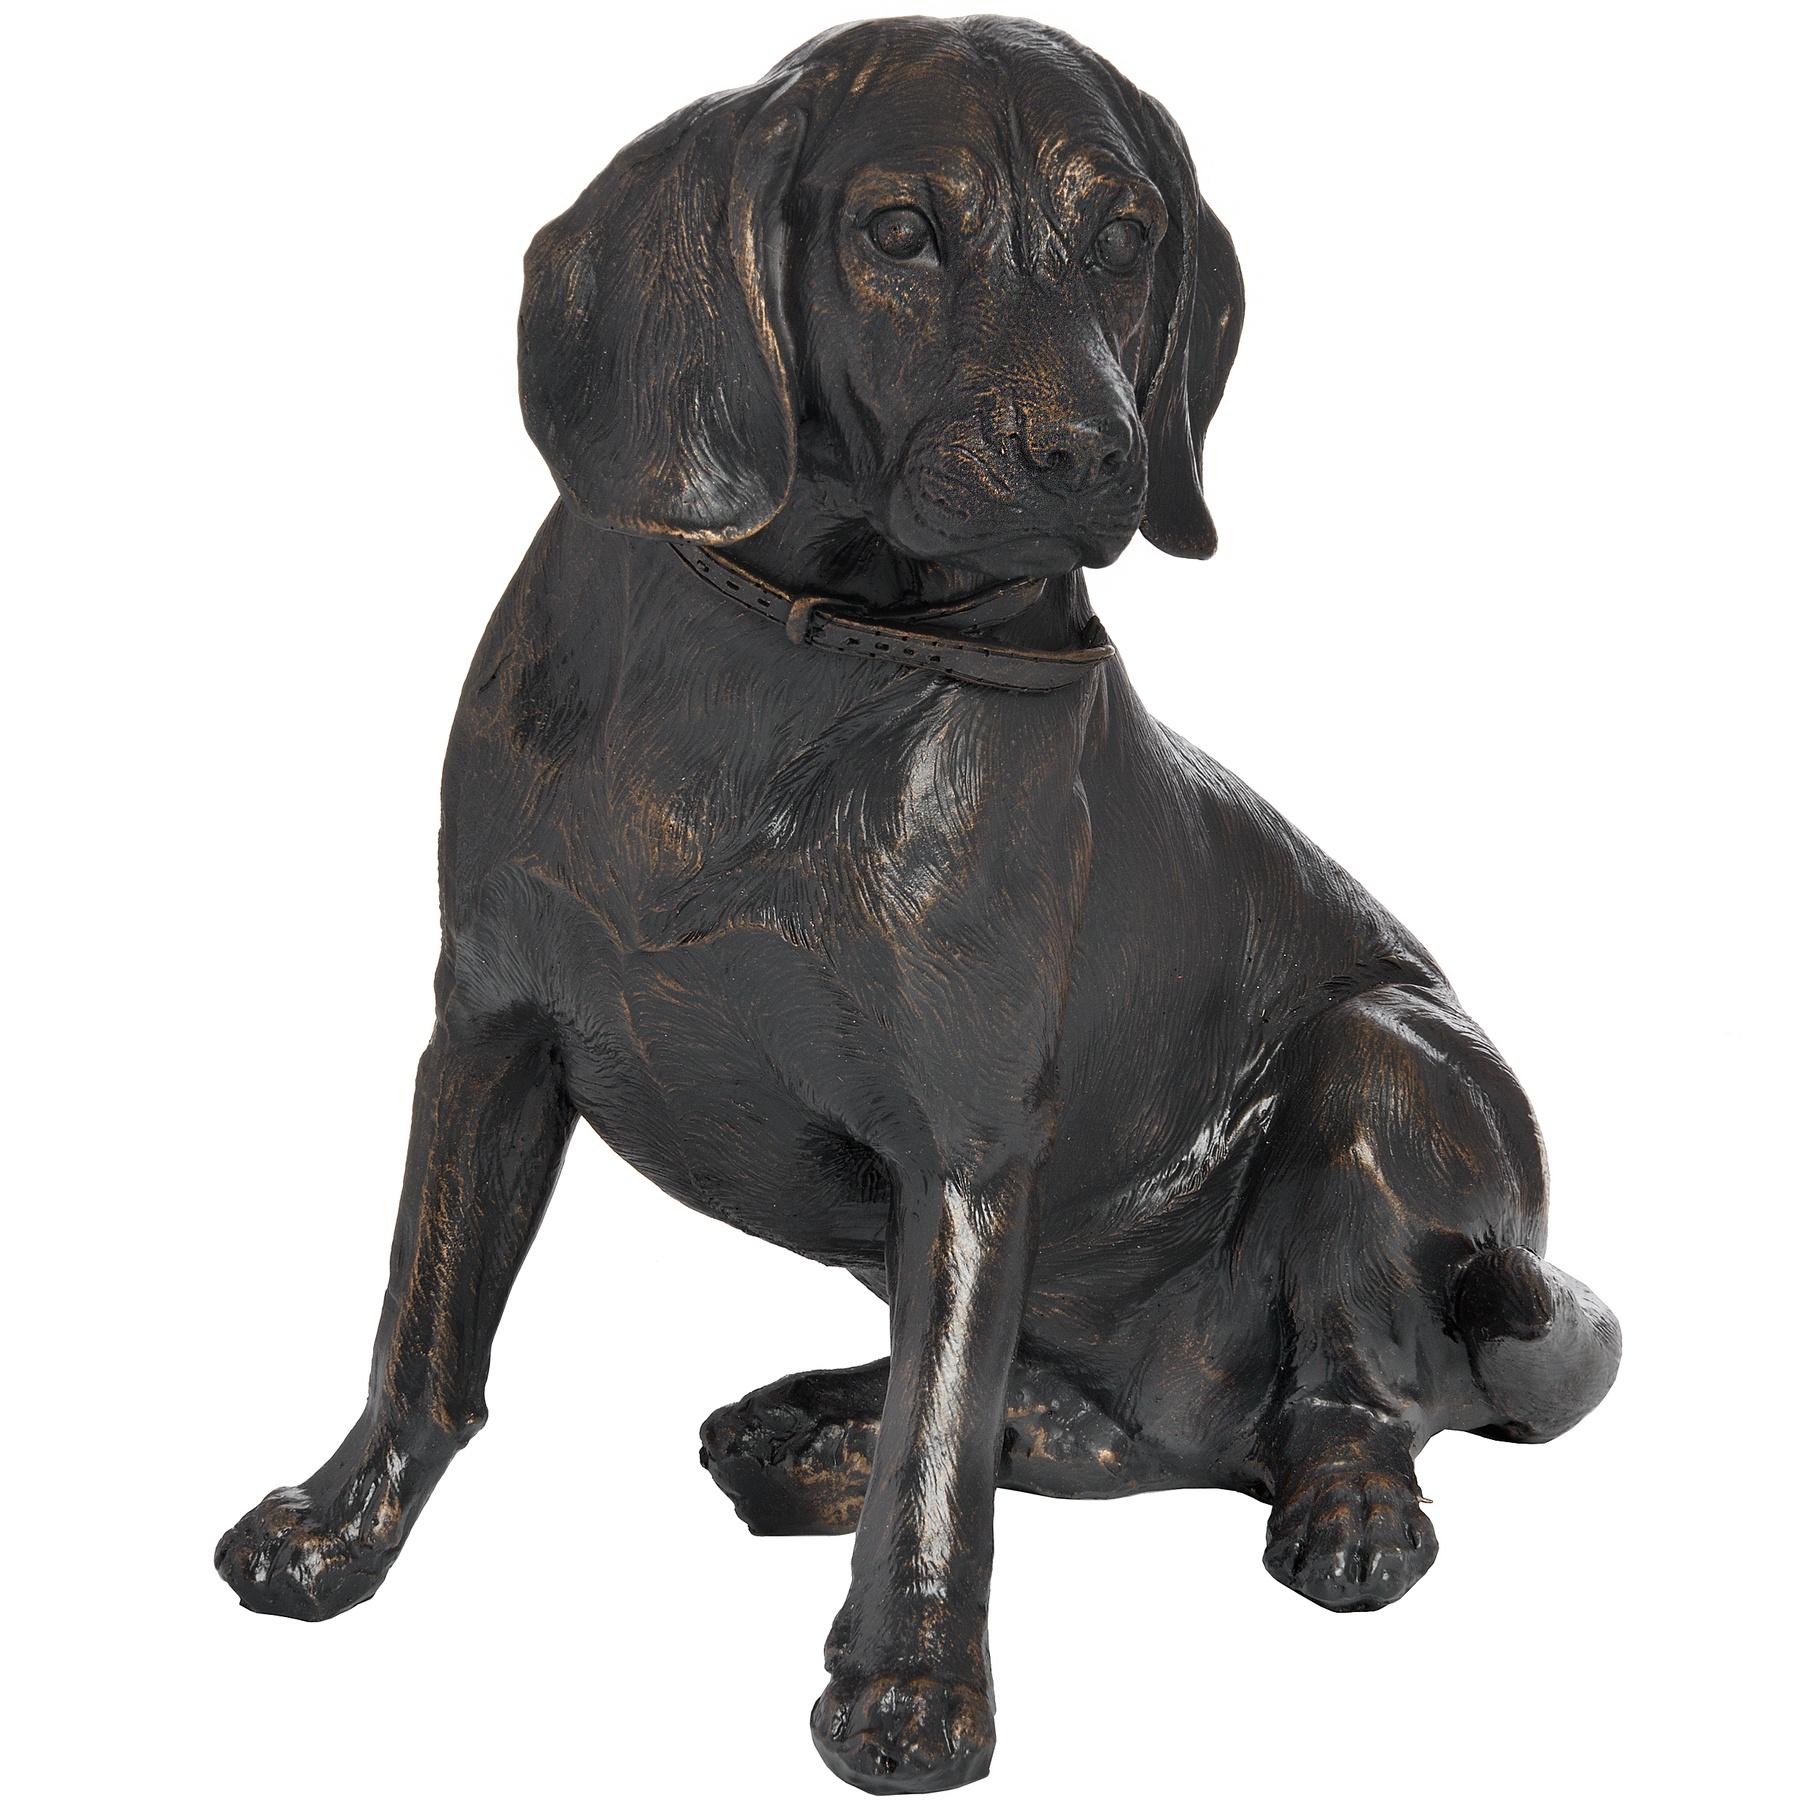 Sitting Spaniel In Antique Bronze - Image 1